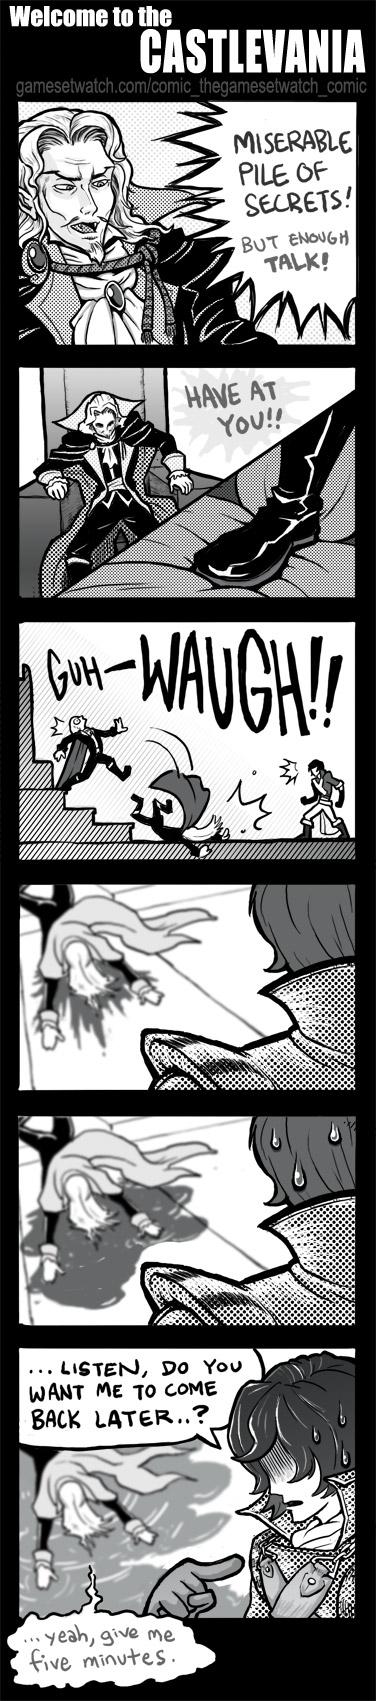 GSW Comic 25 - Castlevania by PersonaSama